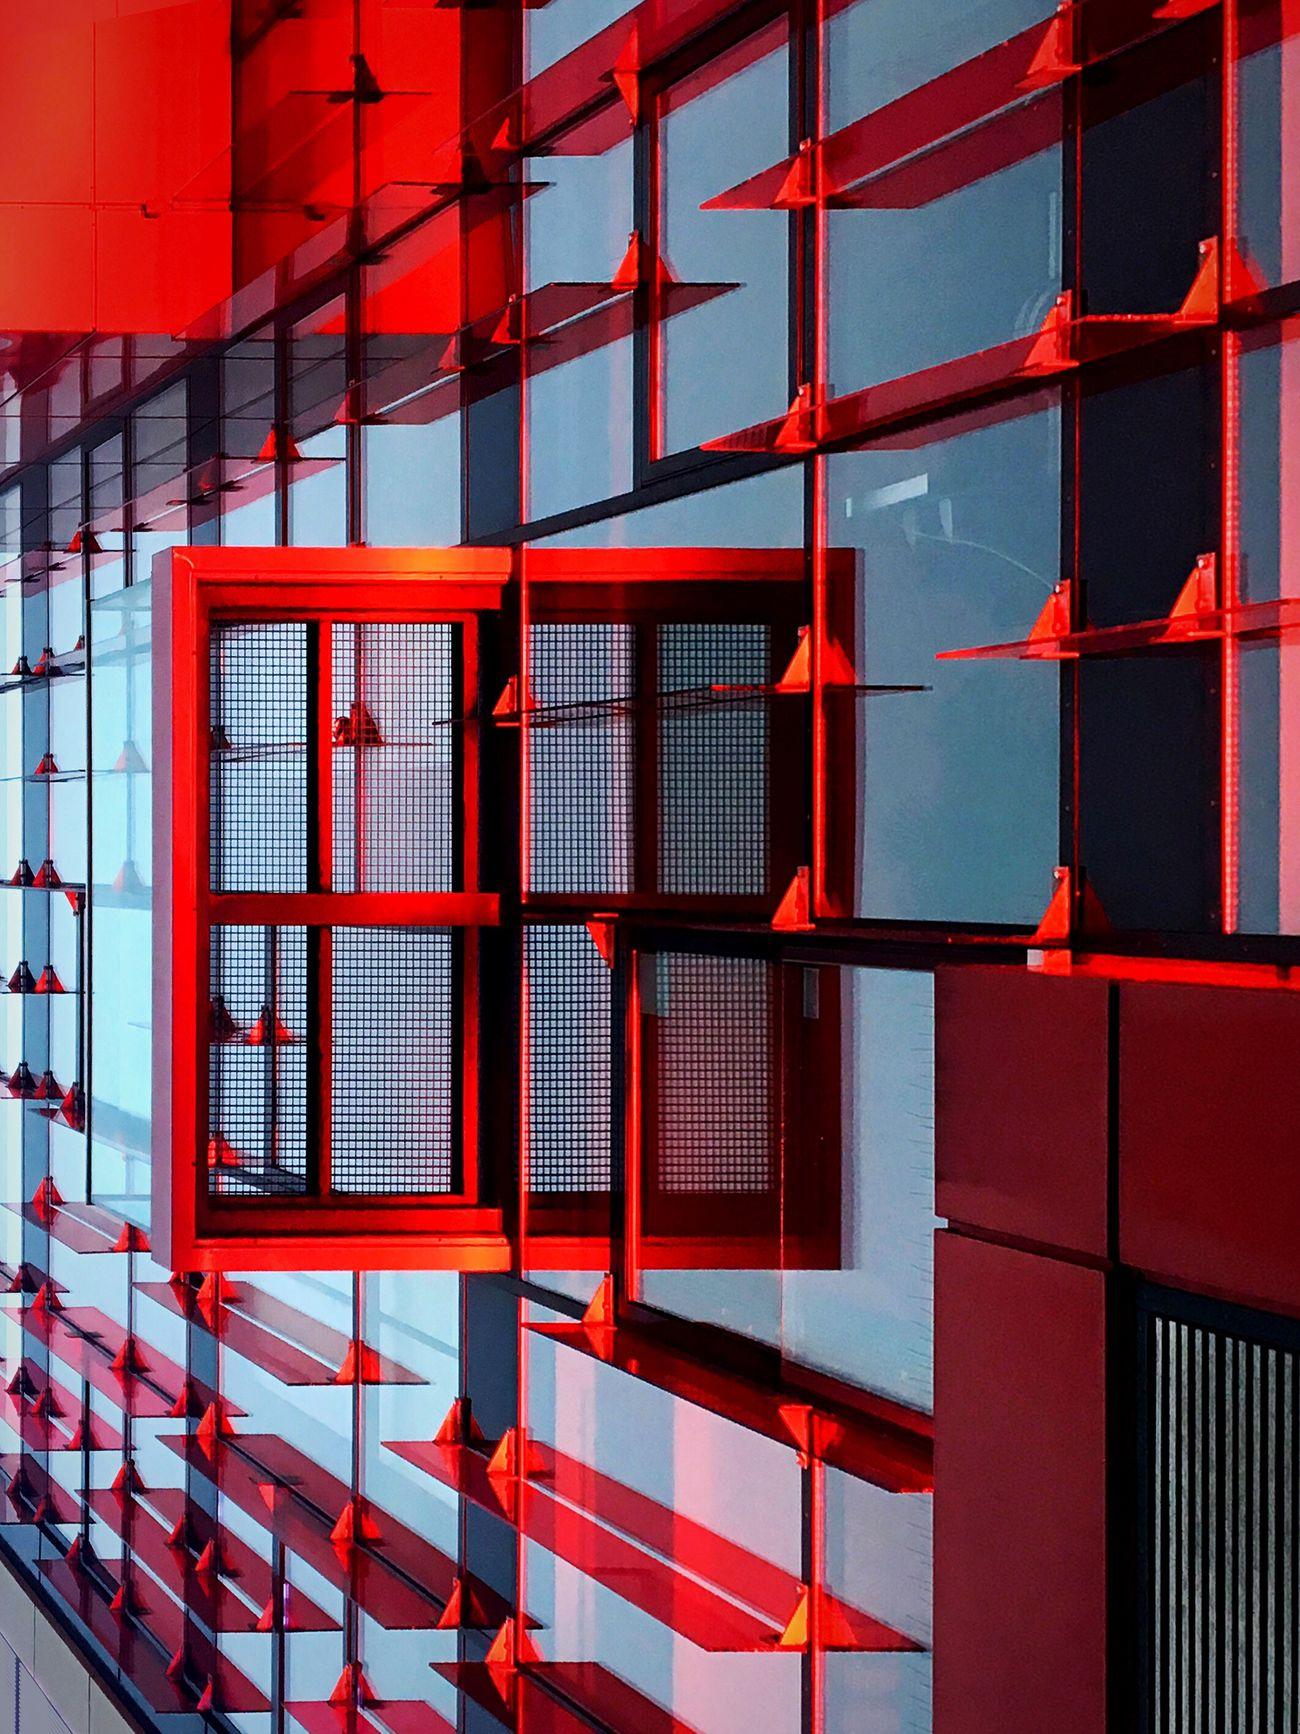 Penetration. Red Architecture Window Façade Facades The Architect - 2017 EyeEm Awards No People Detail Light Illuminated Architecture_collection Architecture Building Exterior Modern Hamburg Reeperbahn  Hamburgmeineperle